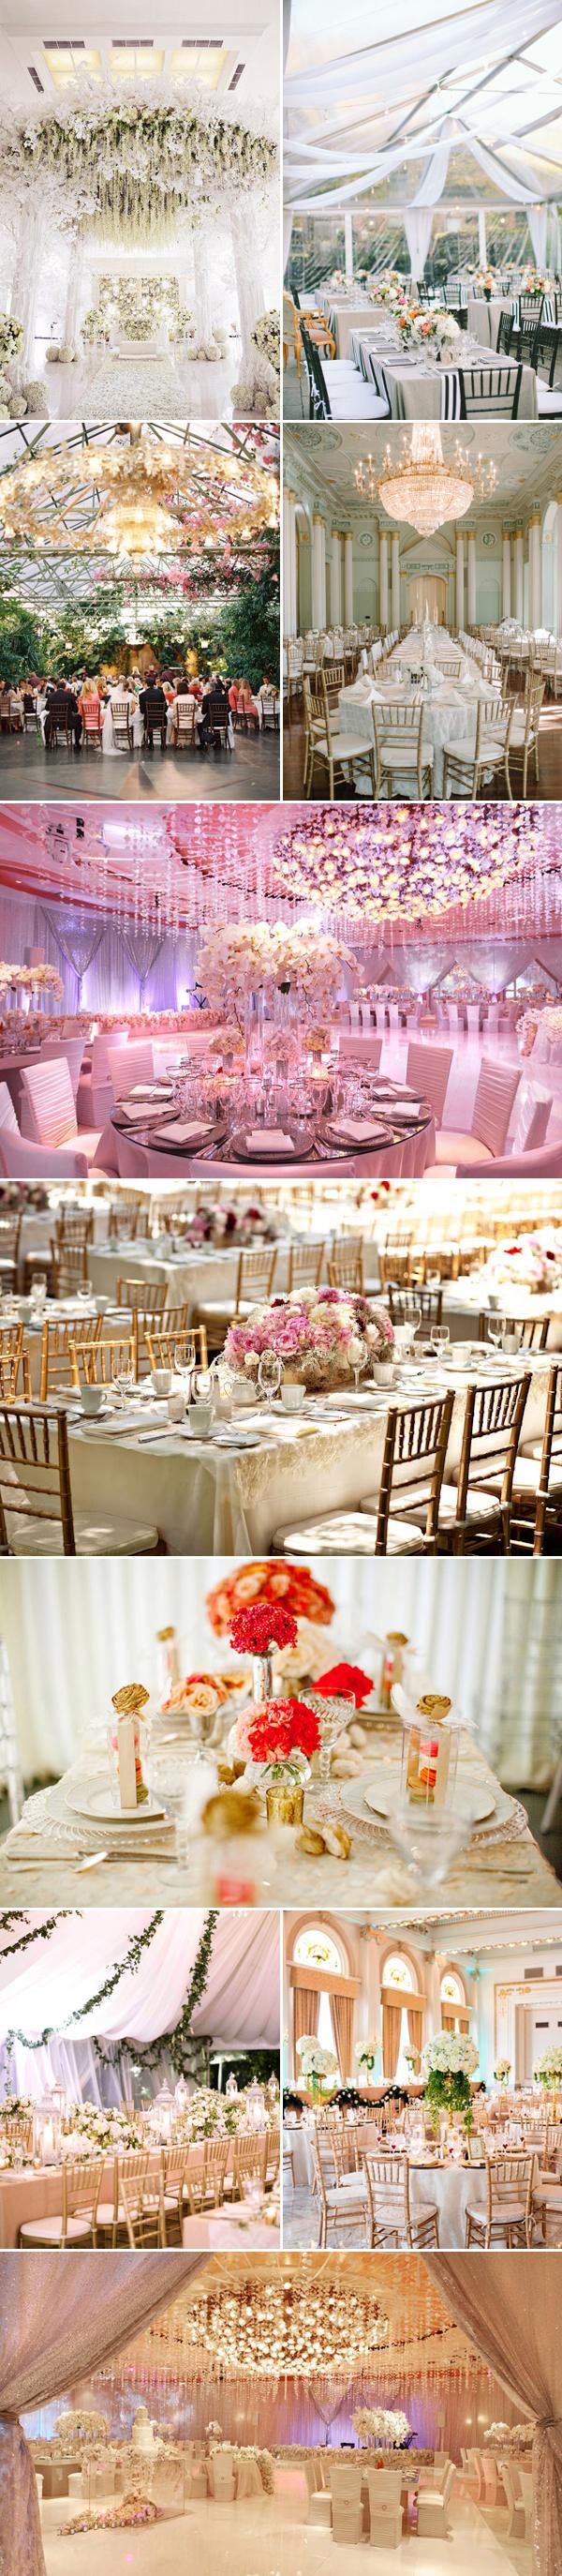 elegant wedding concept ideas